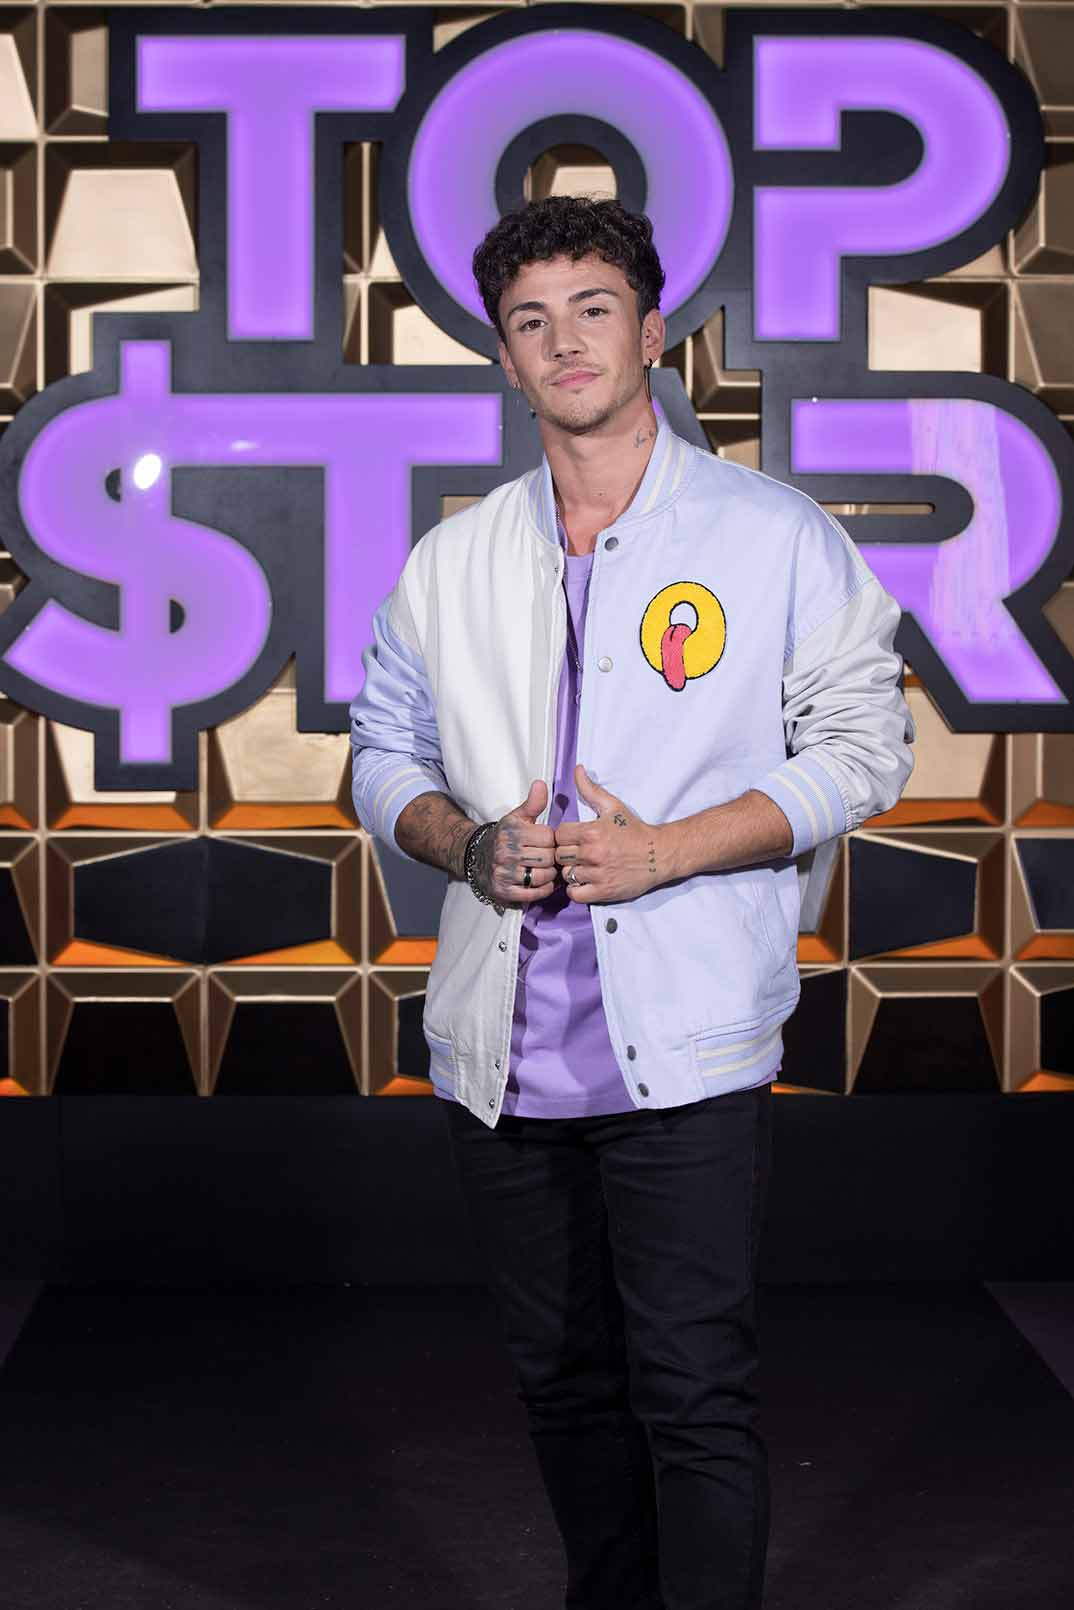 Jxta Martin - Top Star © Telecinco